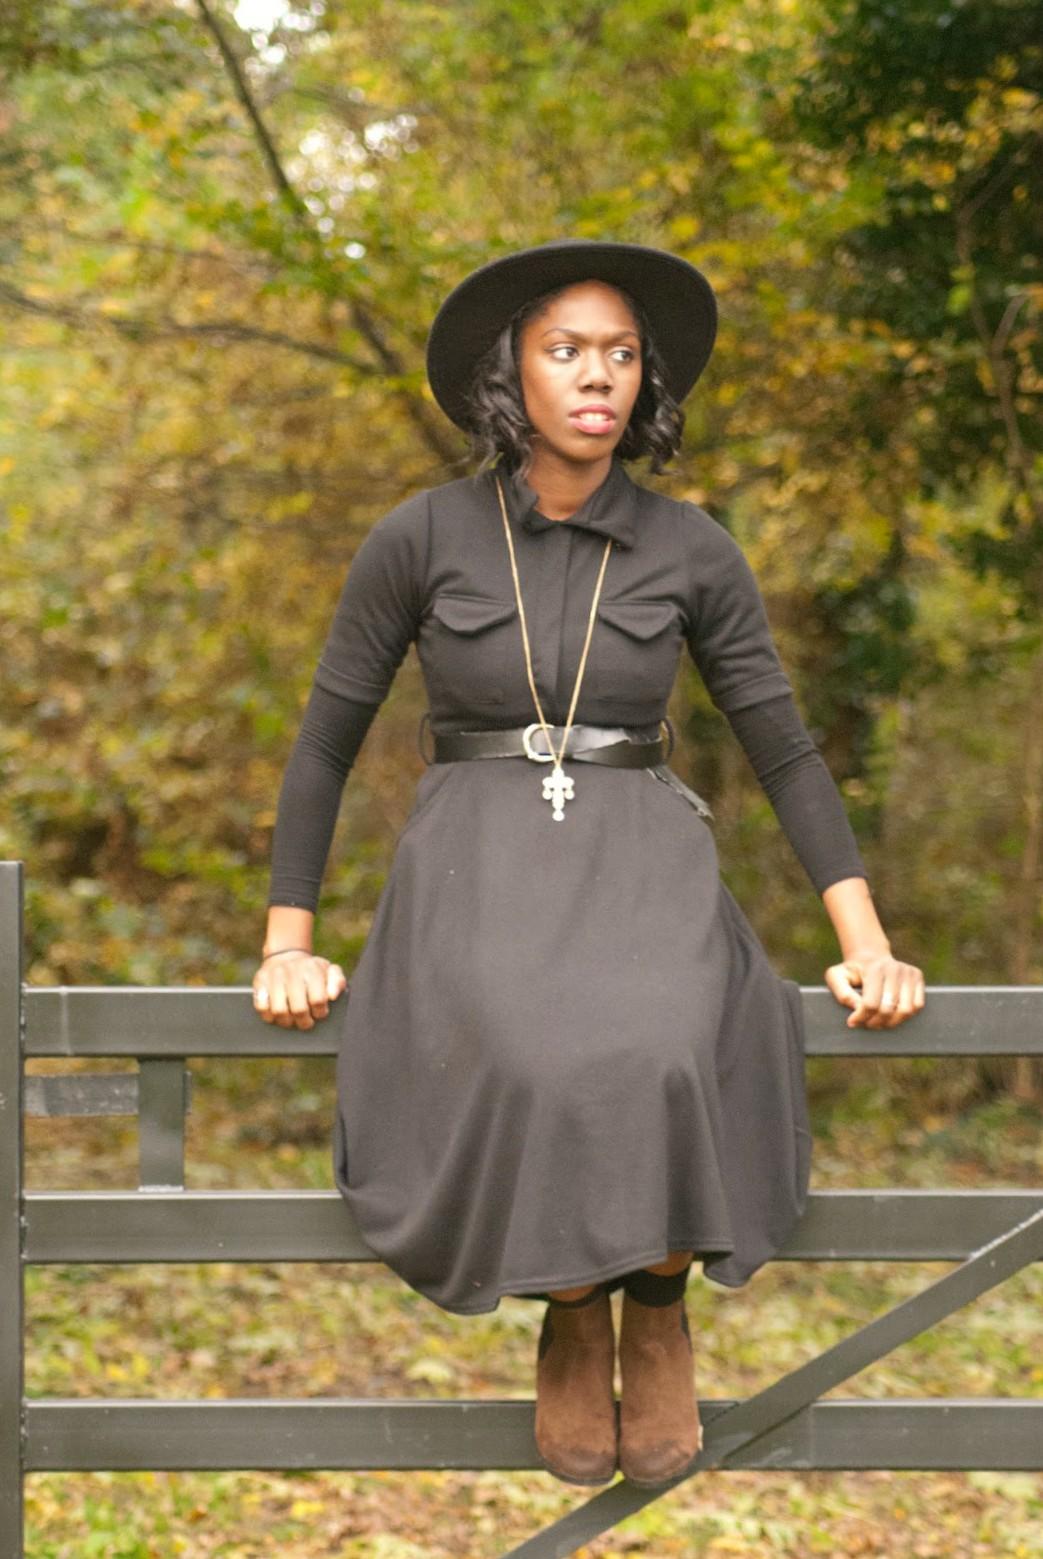 Boohoo black midi dress, fryent country park, fashion blogger, 100 Ways to 30, Style & Fashion